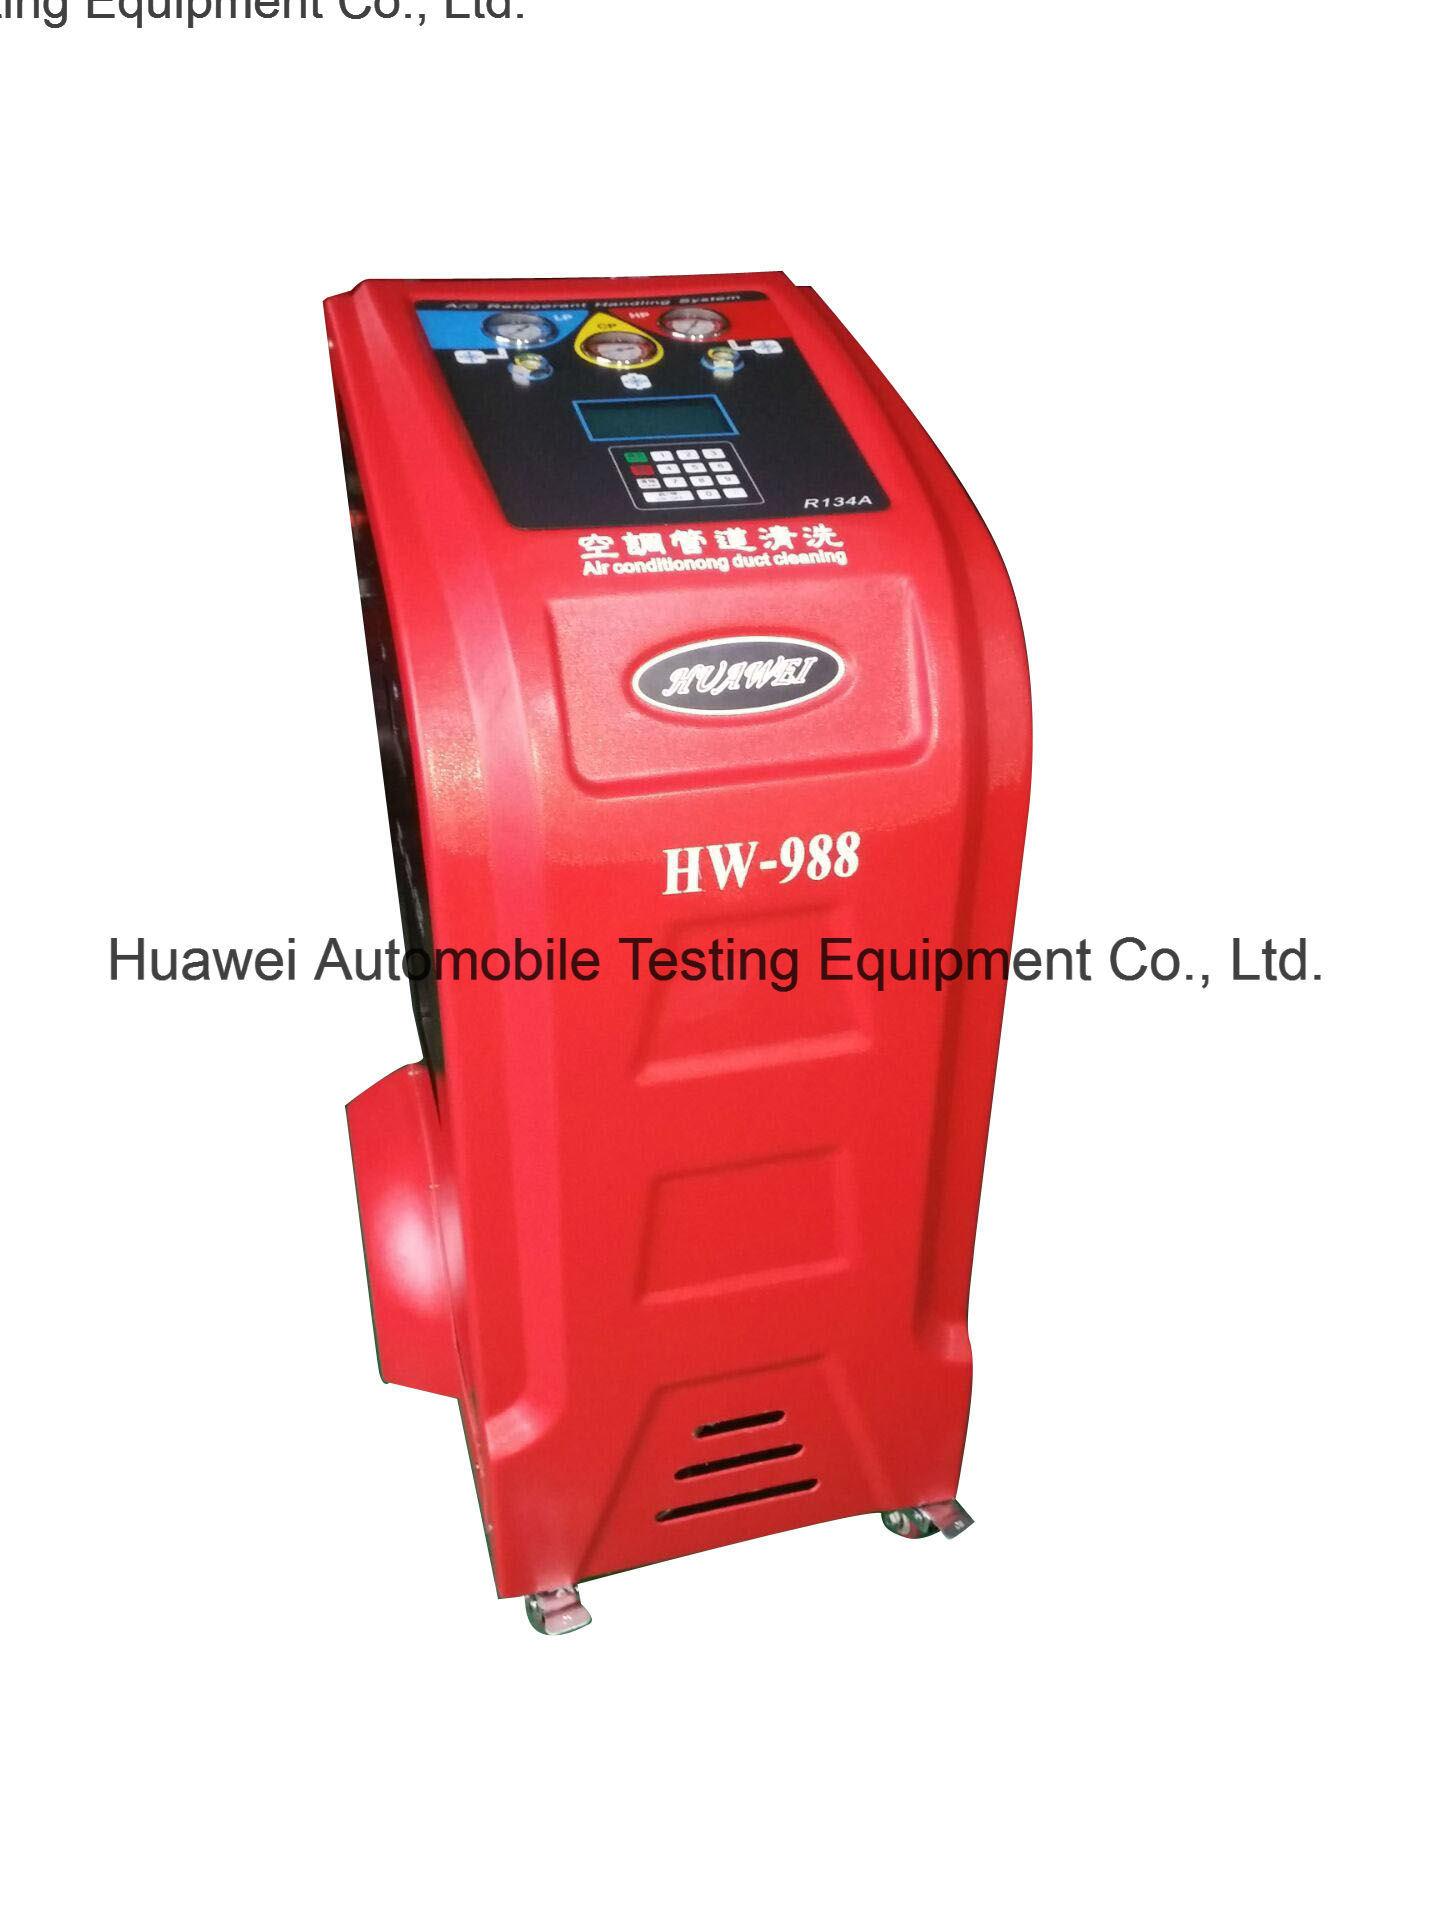 Hw-988 Car AC Refrigerant Recovery Machine Refrigerant Reocvery